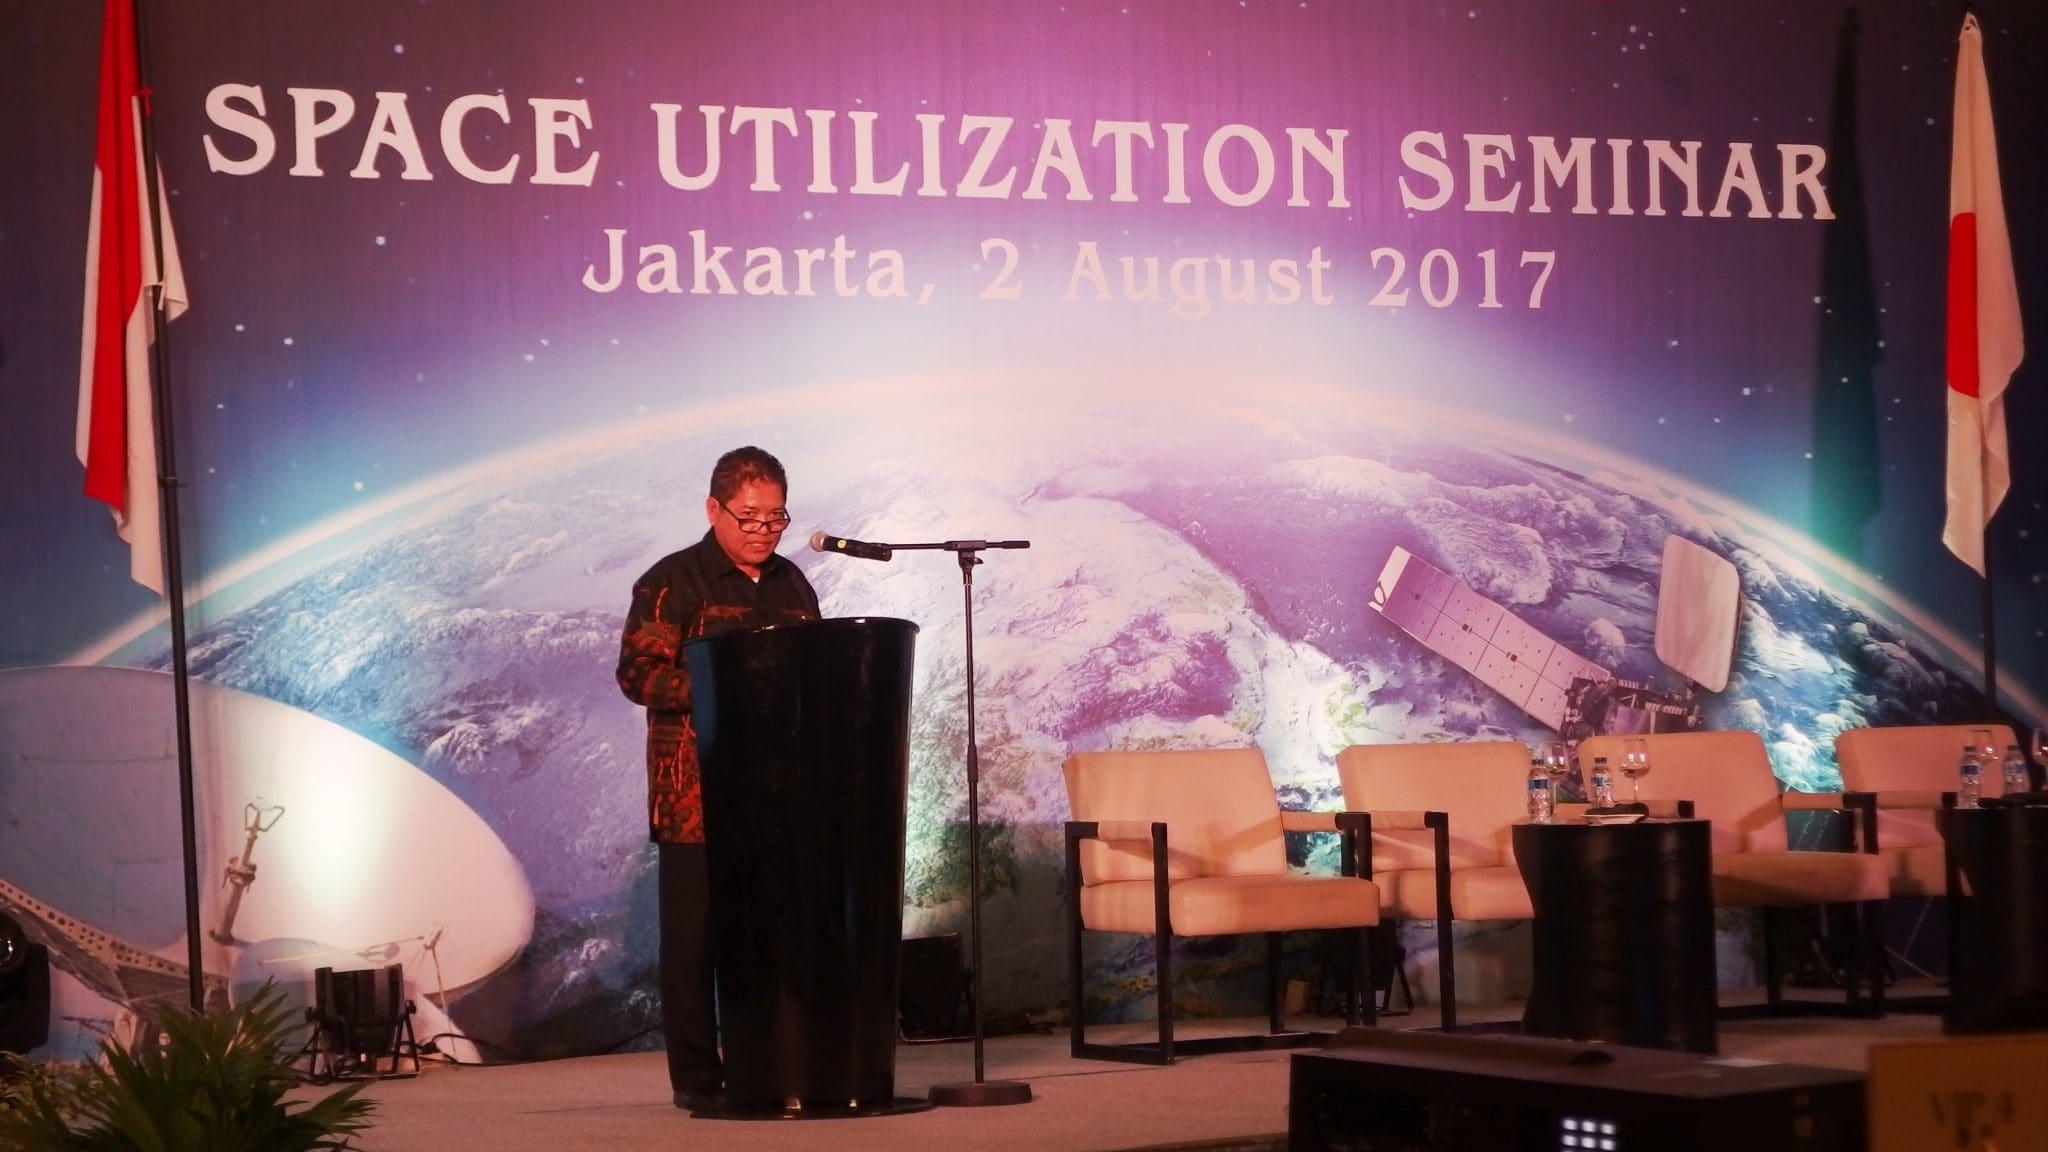 _02082017__Seminar_on_Space_Utilization_in_Indonesia___8_